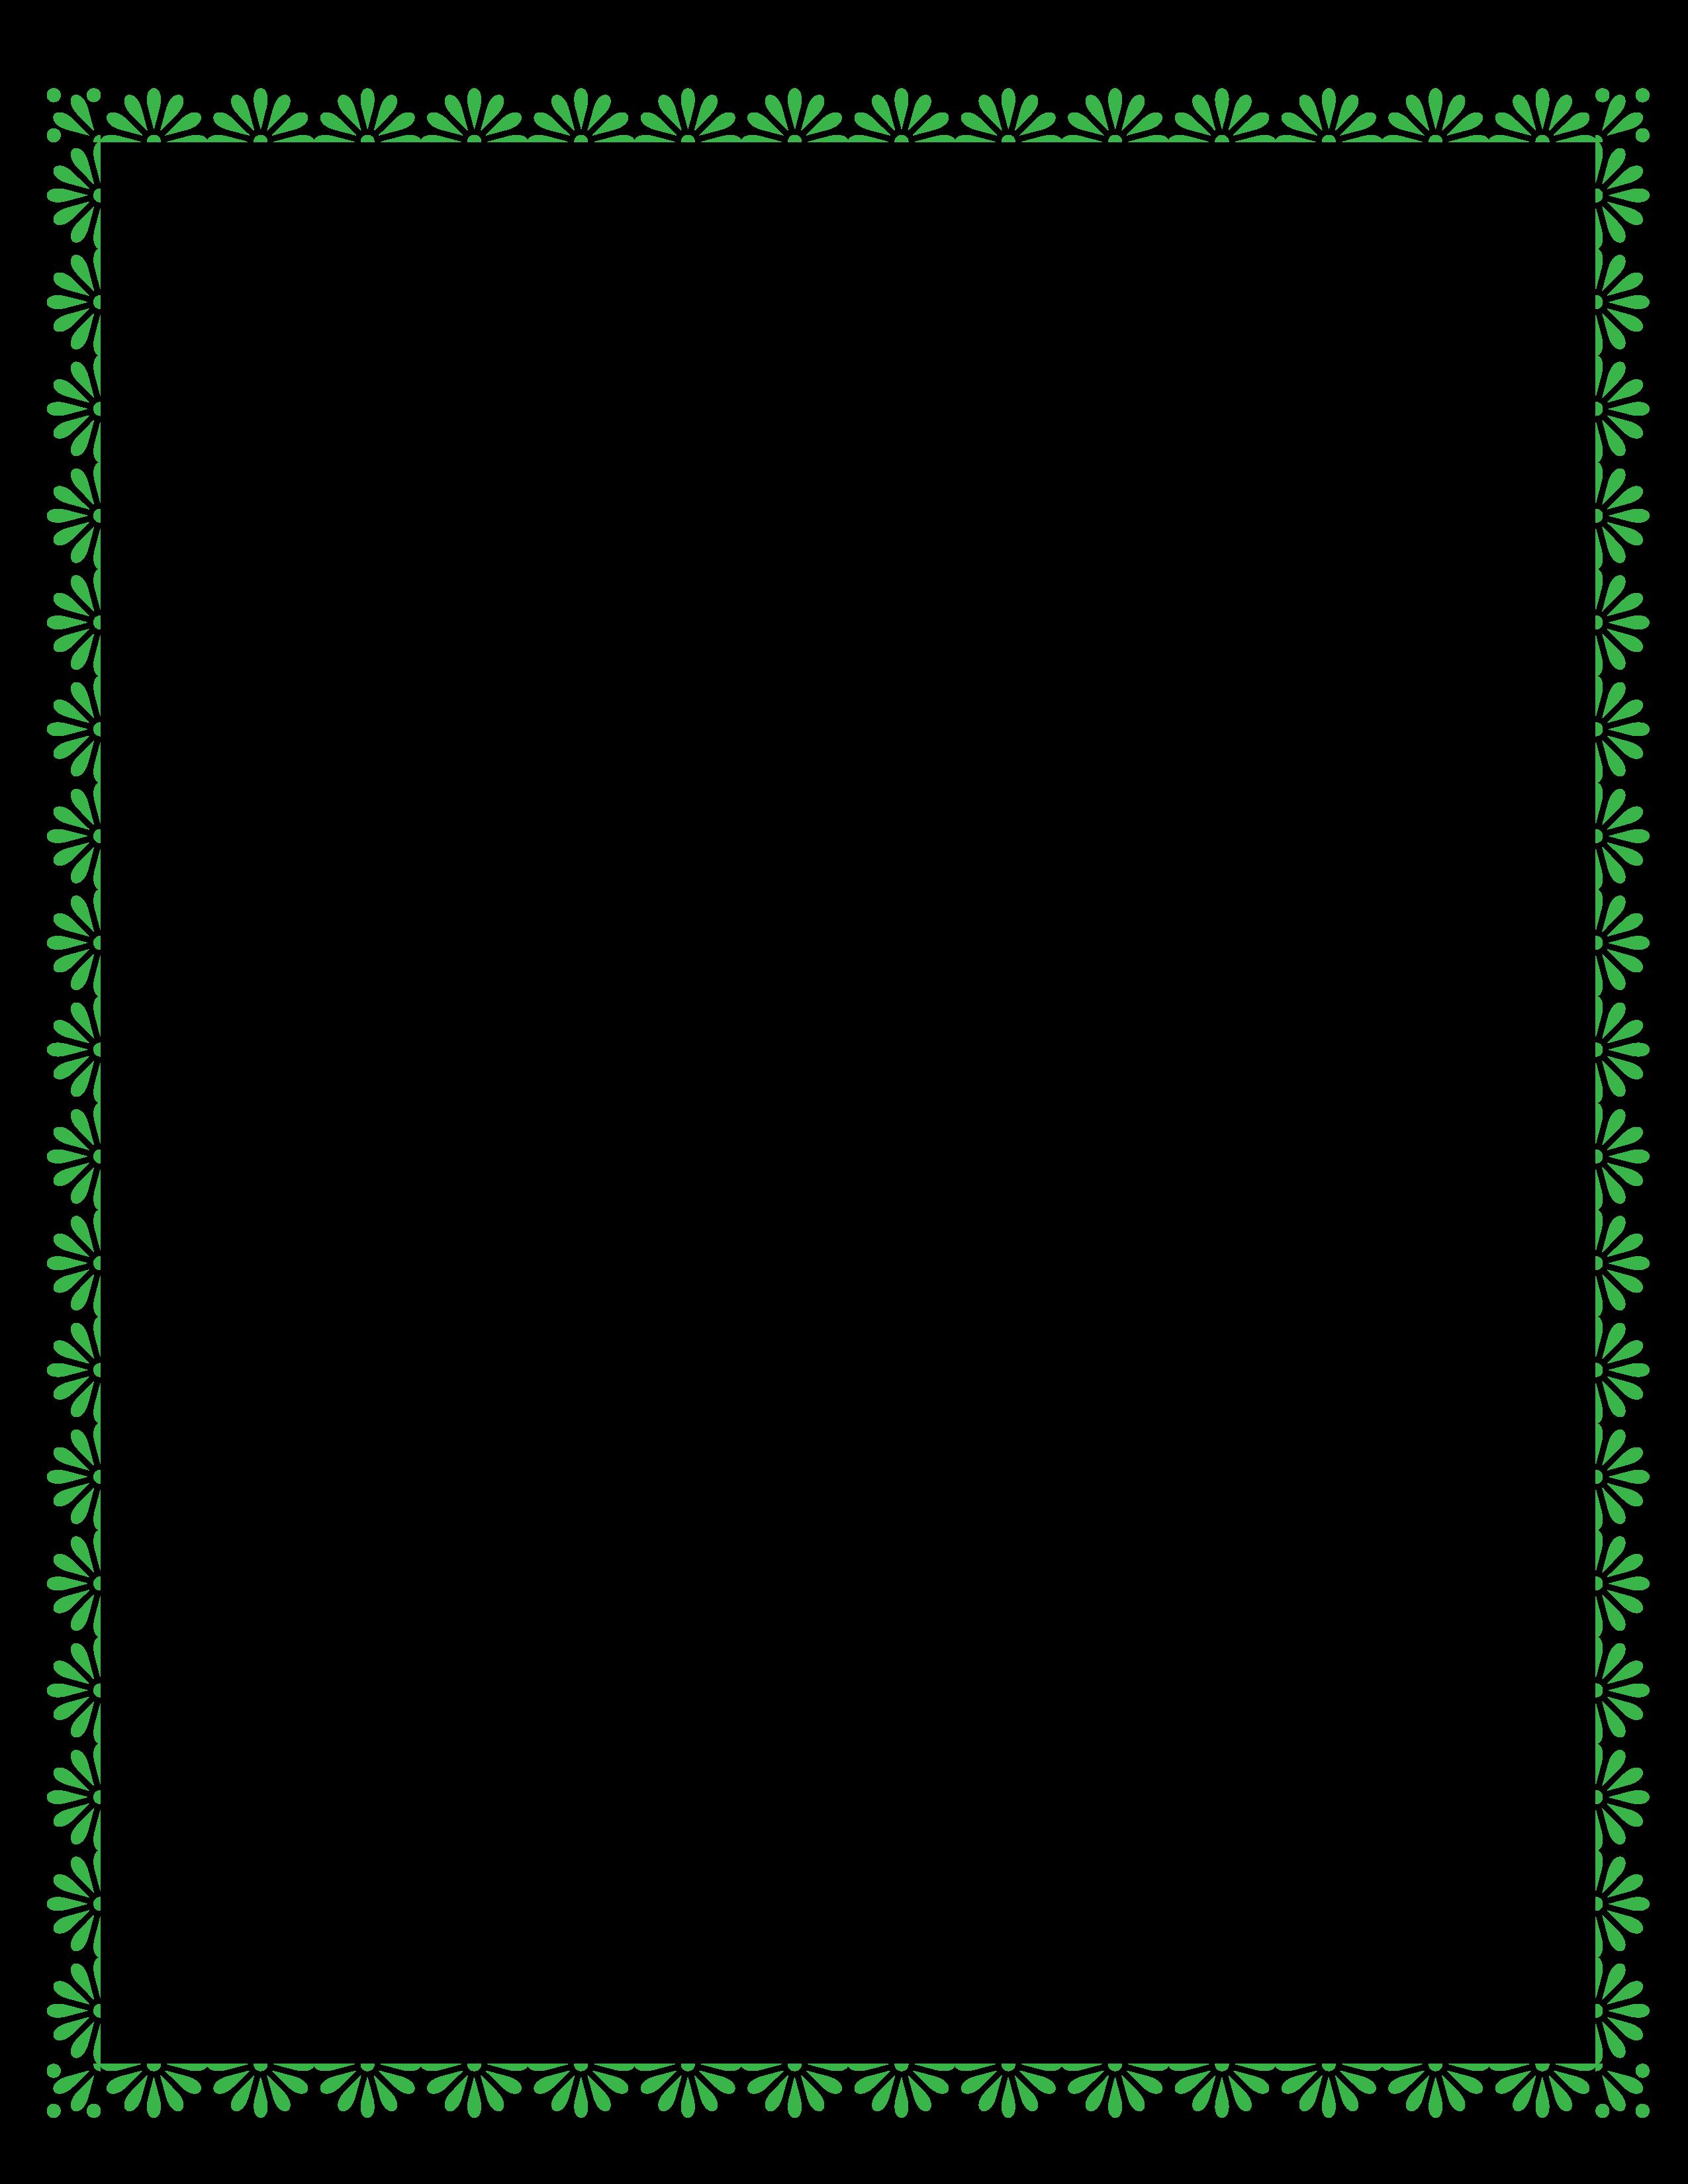 Free snowflake clipart borders and frames vector transparent library Pin by ✿Naz YILMAZ✿ on Renkli Çerçeveler | Pinterest | Clip art ... vector transparent library